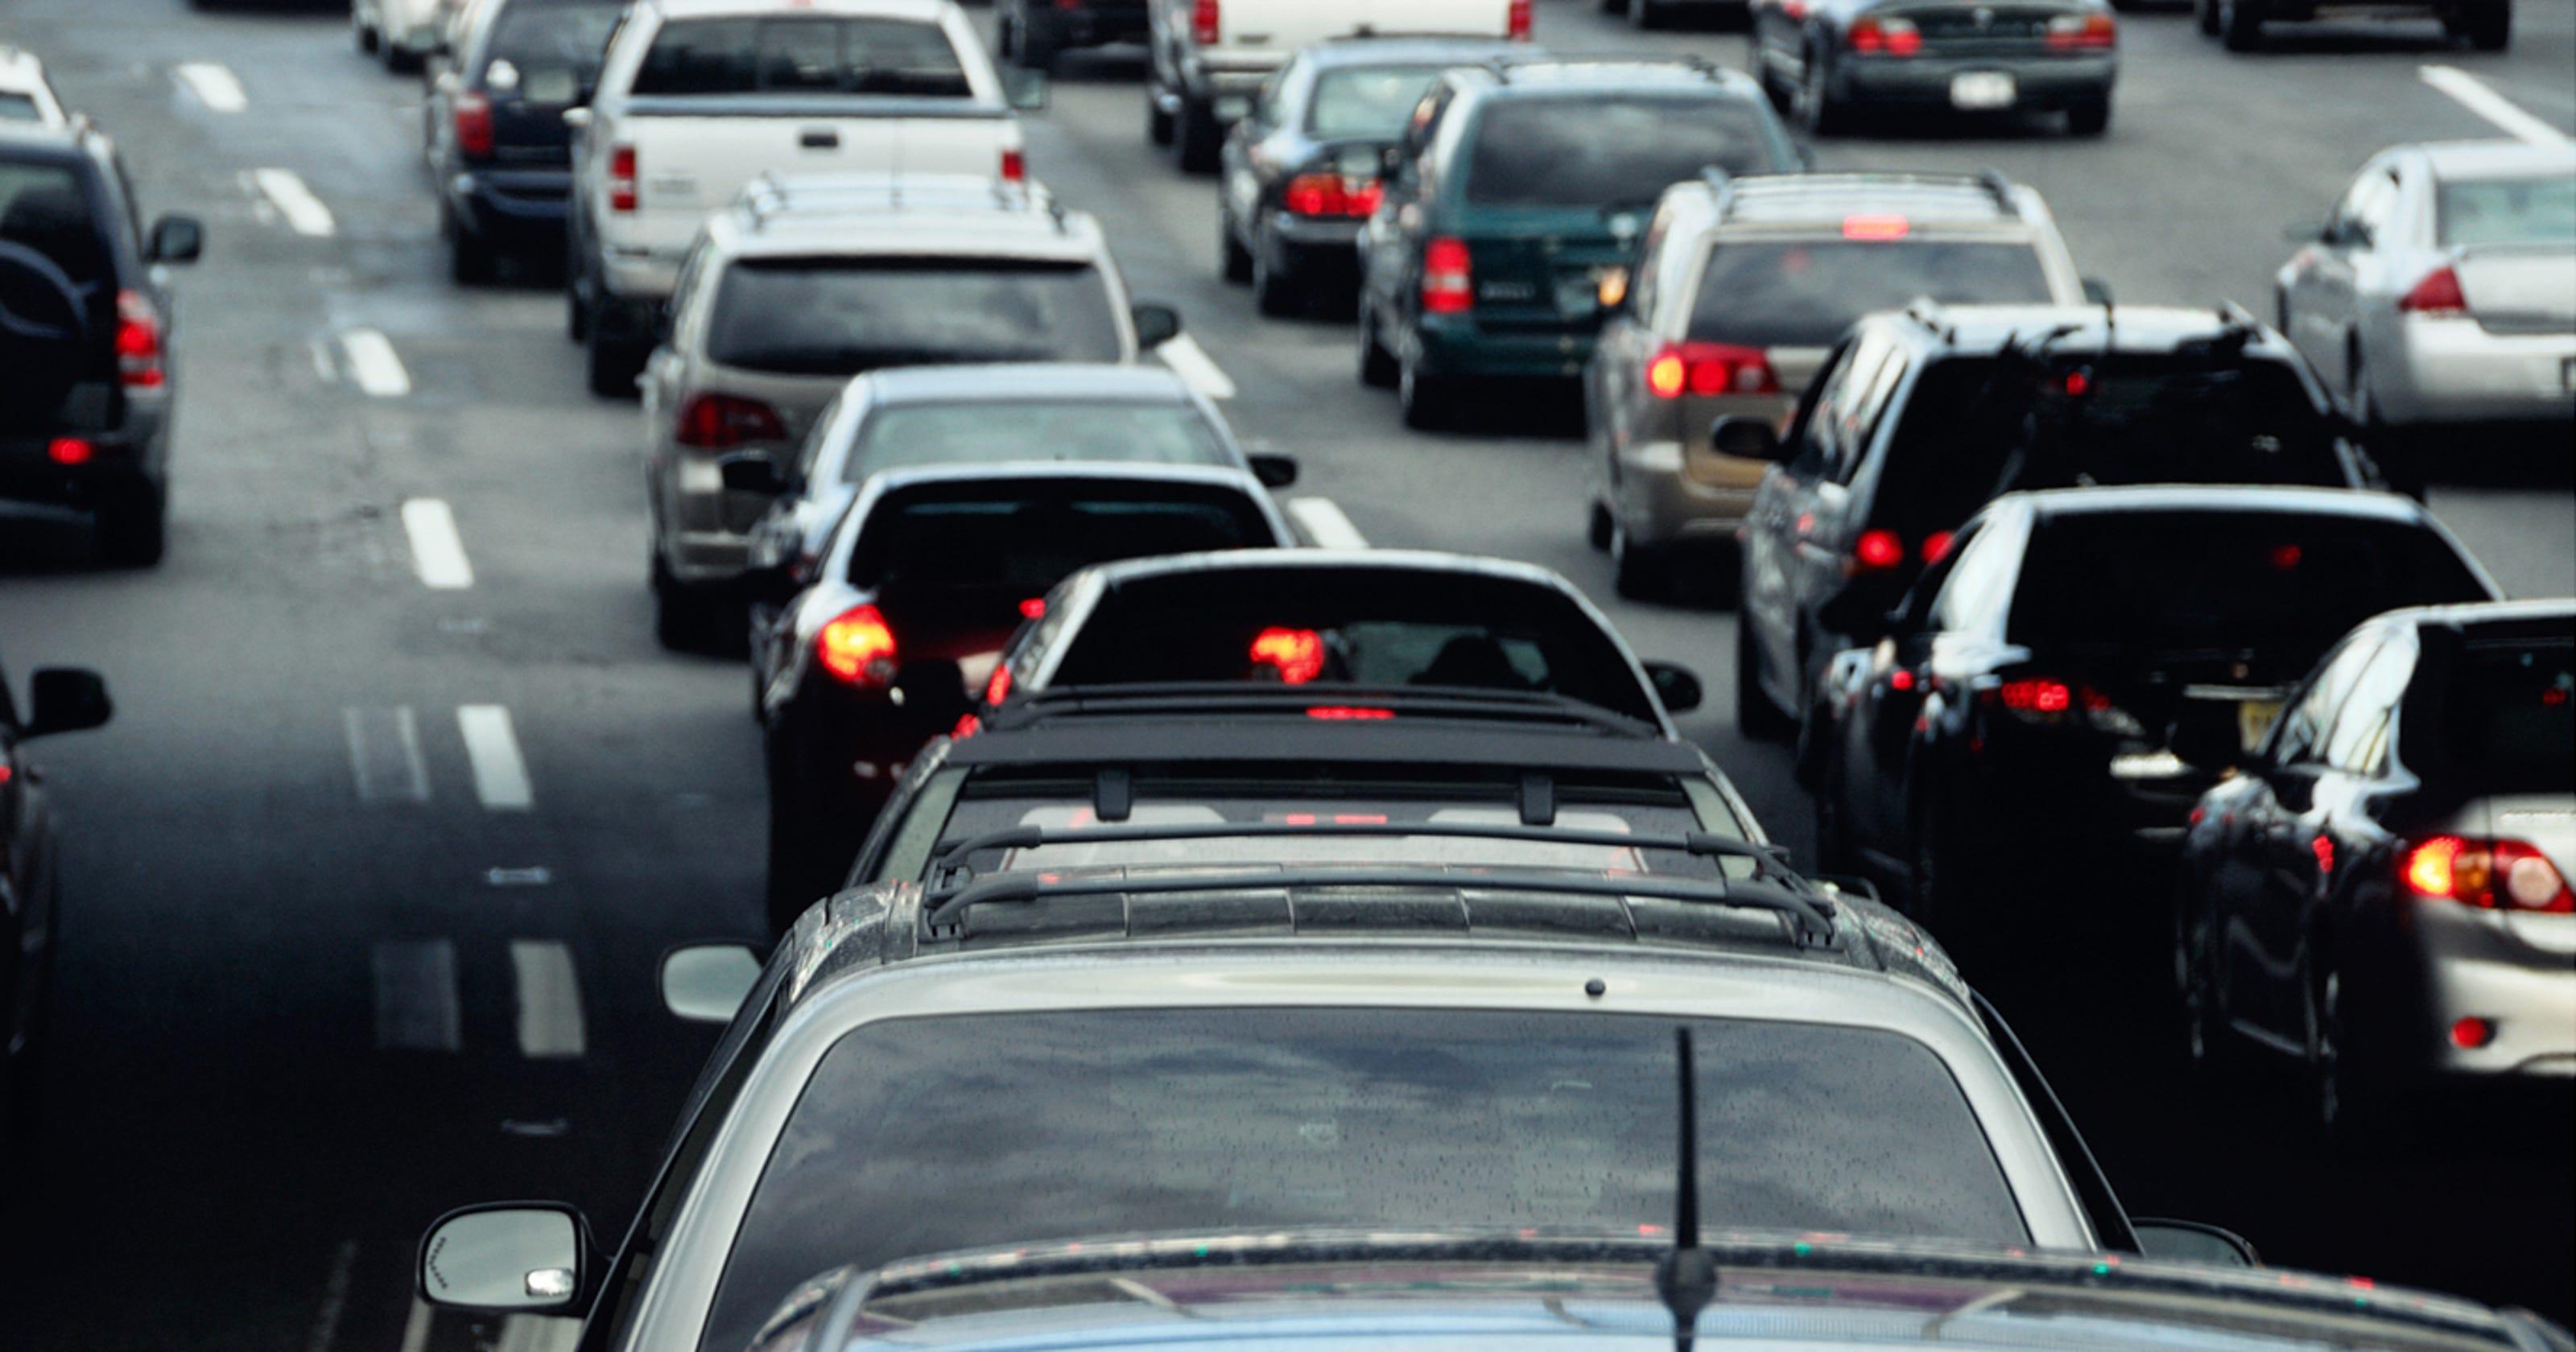 Car accidents: Subaru Crosstrek involved in most at-fault